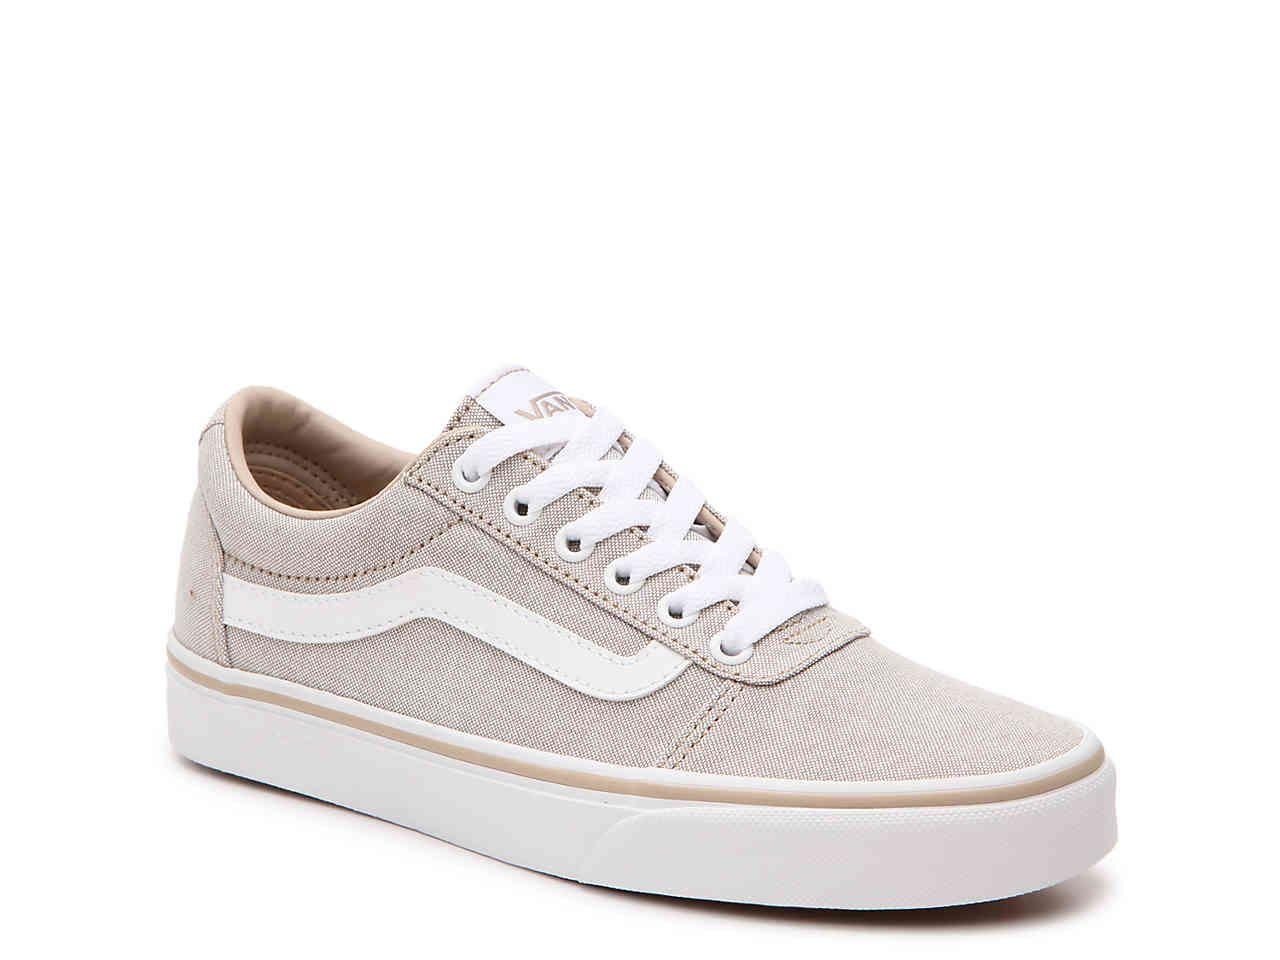 Vans Ward Sneaker - Women's Women's